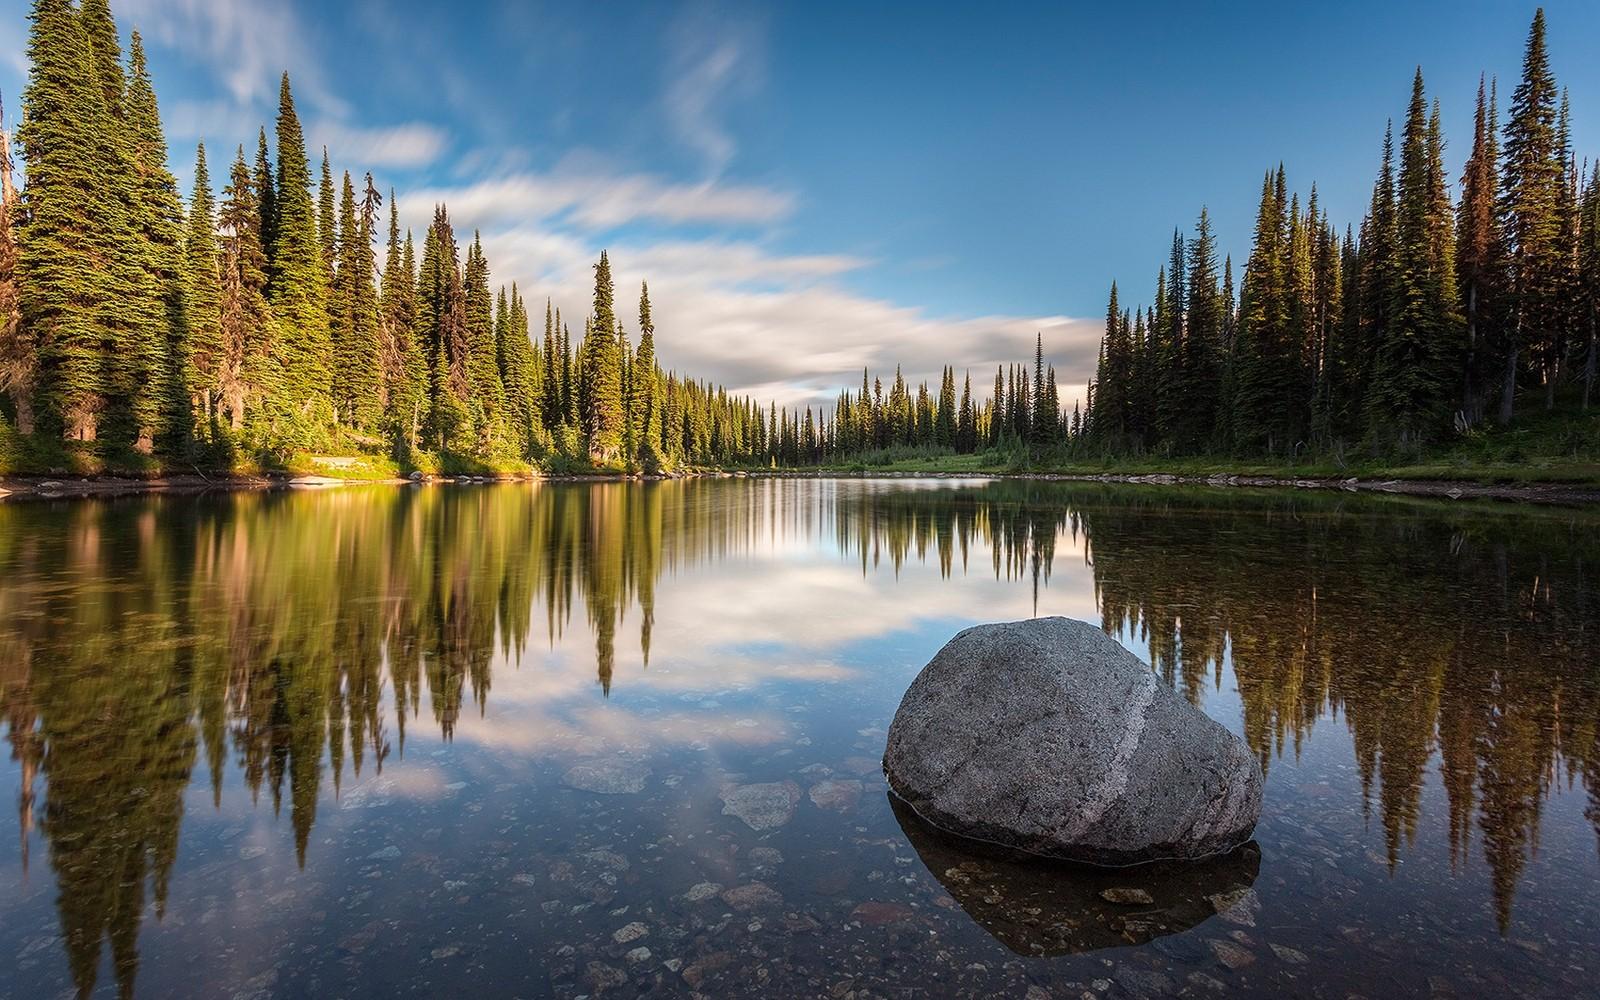 Cute Anime Lock Screen Wallpaper British Columbia Canada Calm Forest Lake Landscape